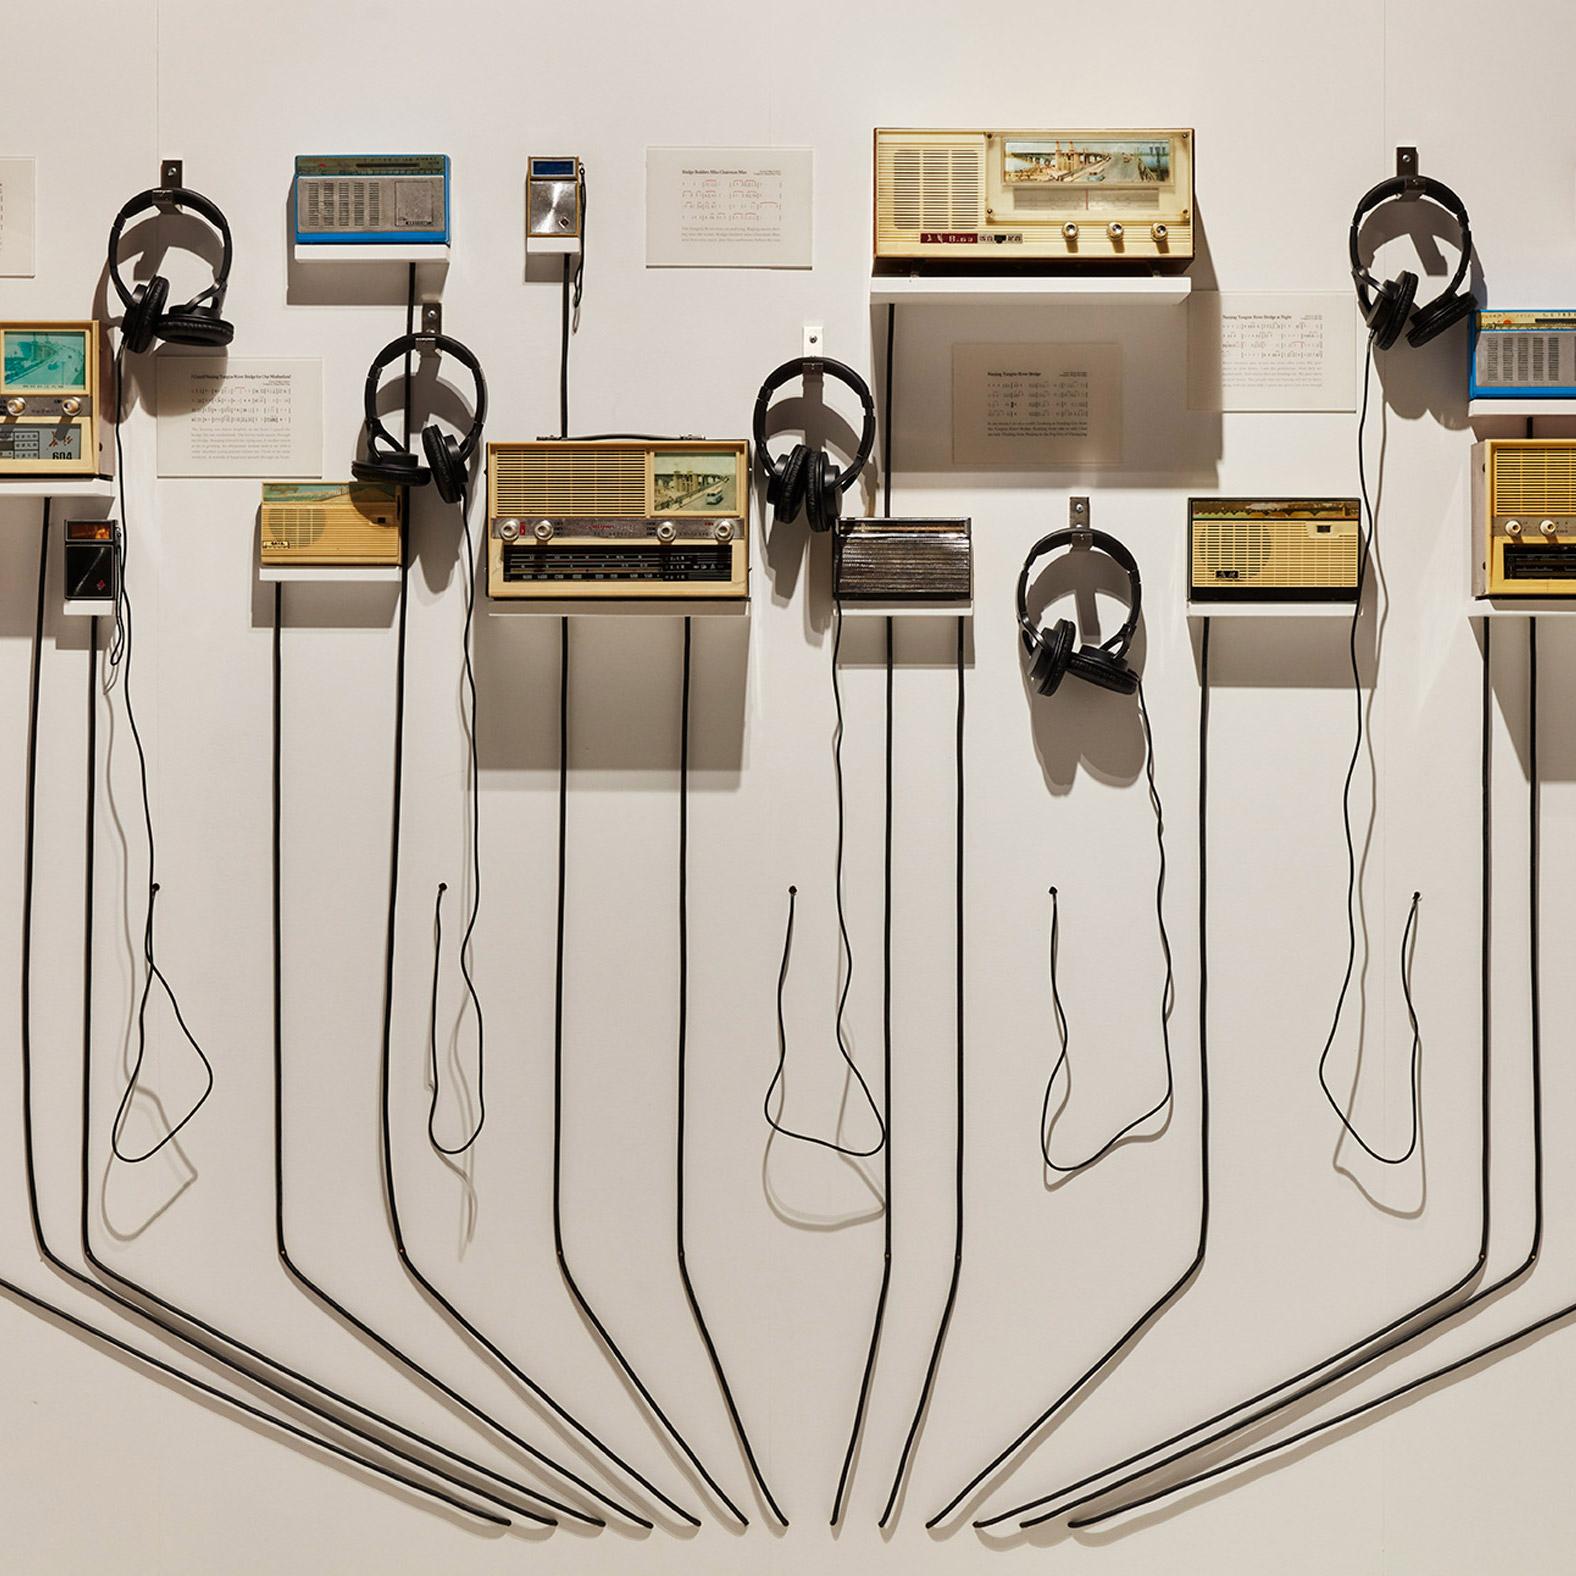 triển lãm London Design Biennale 1